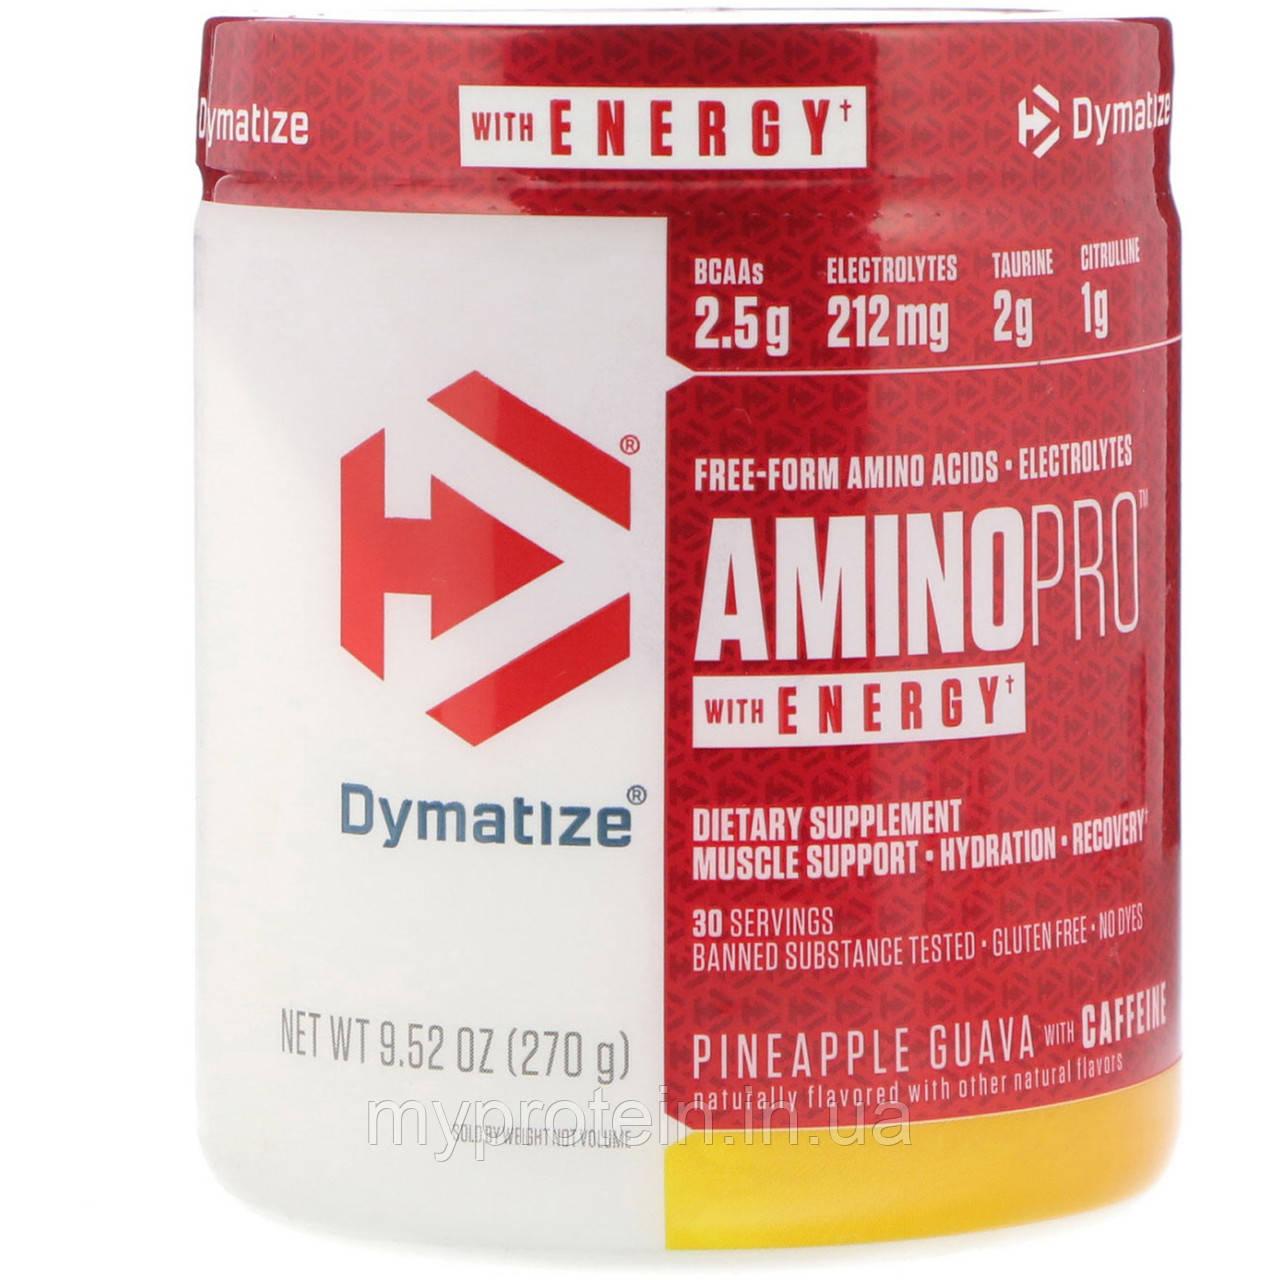 DymatizeАминокислотыAmino Pro Energy270 g